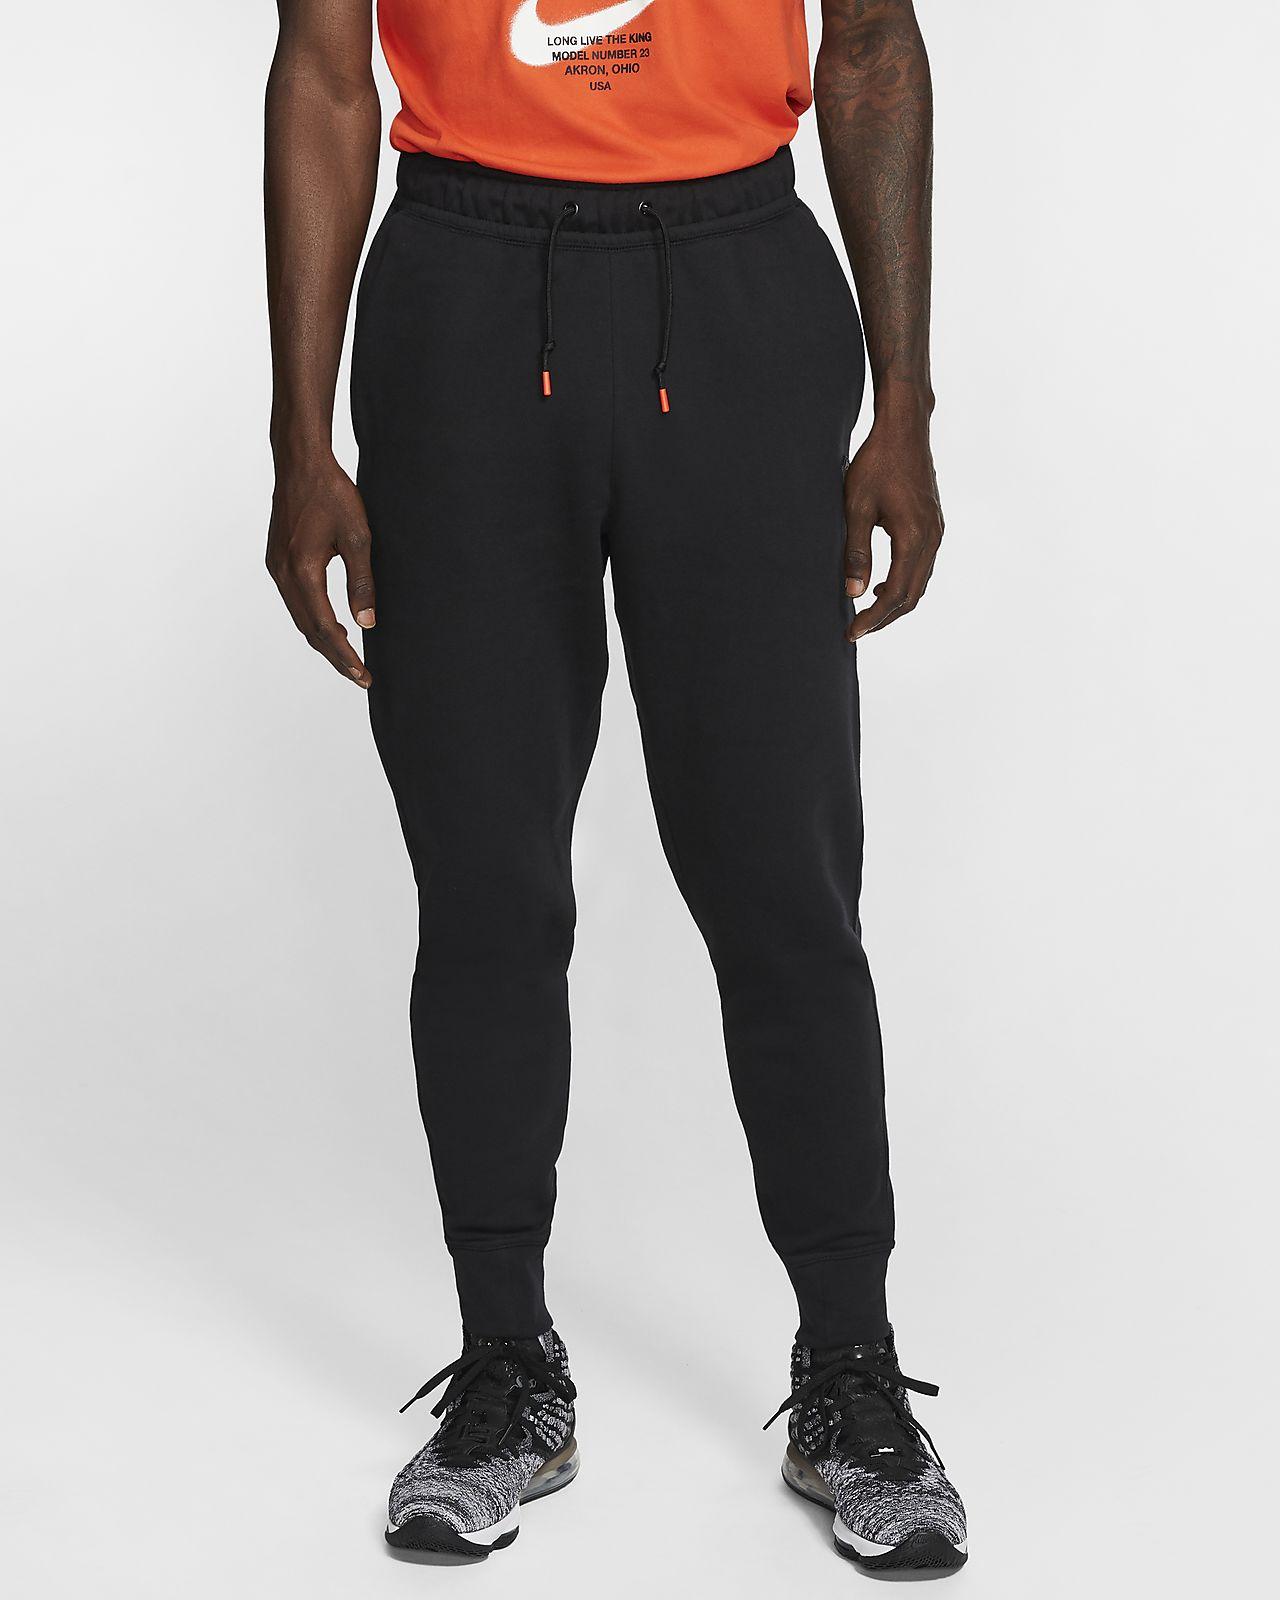 Pantalon de basketball LeBron pour Homme